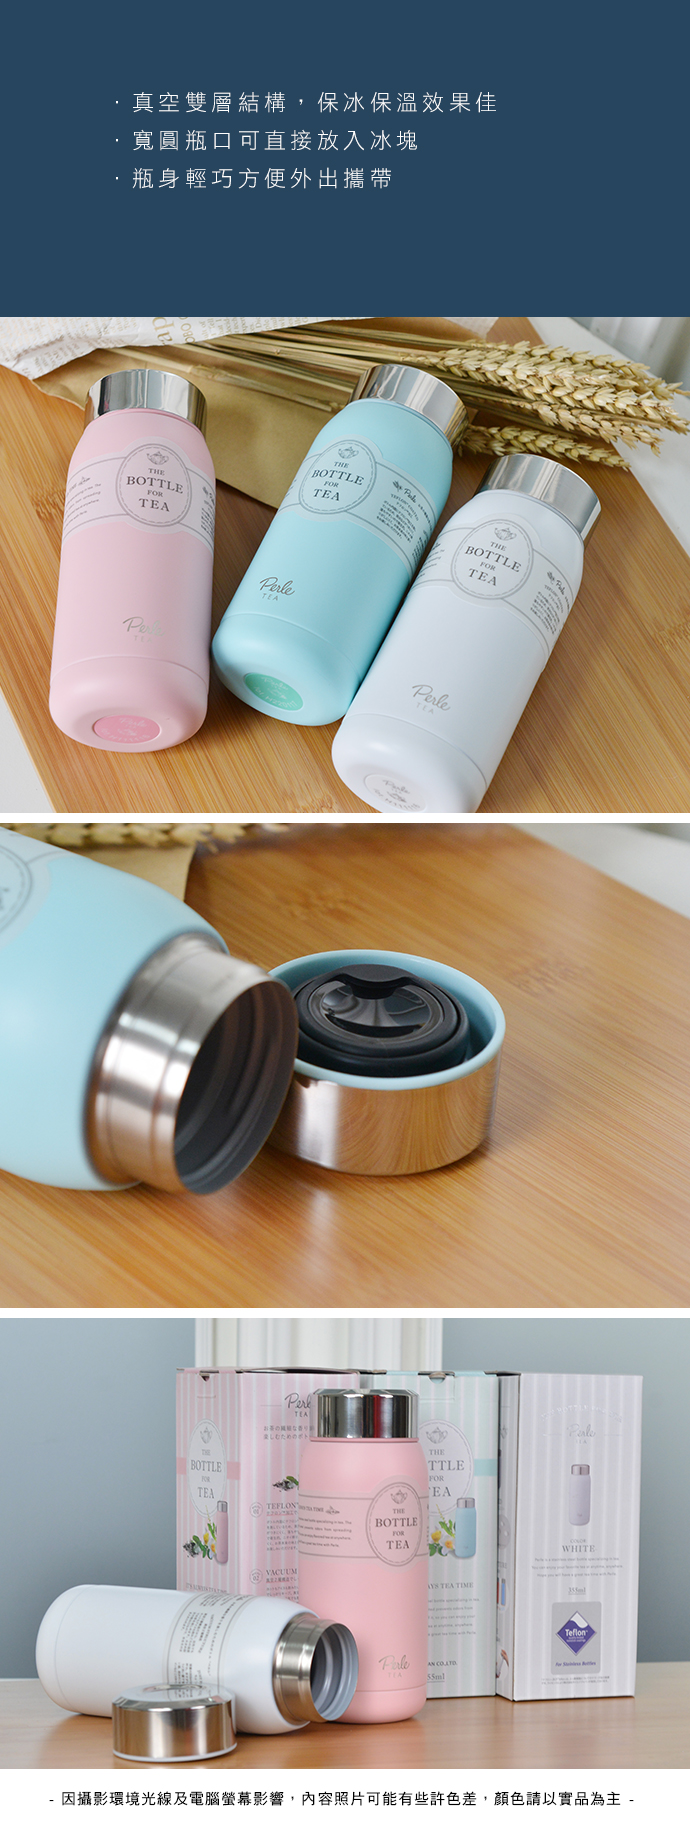 CB Japan|Perle 粉色佳人雙層保冷保溫杯 - 蜜糖粉